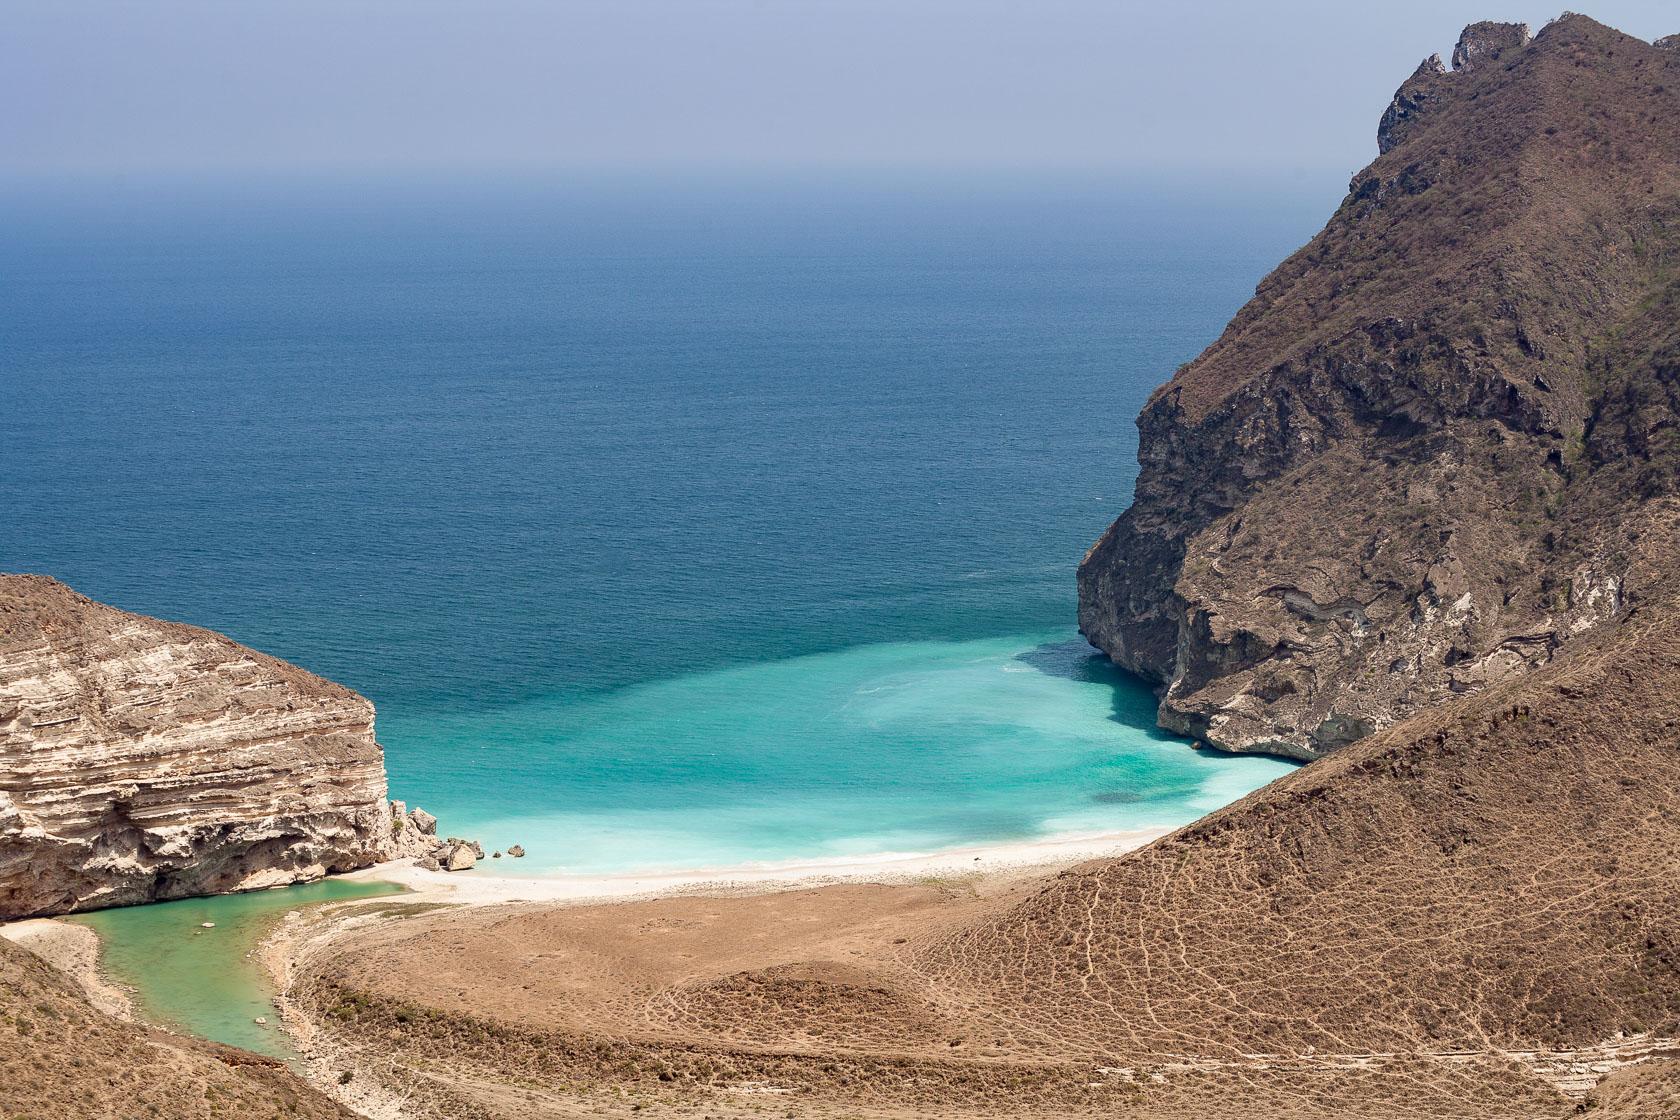 Wadi Al Mughsayl, dans le Dhofar à Oman